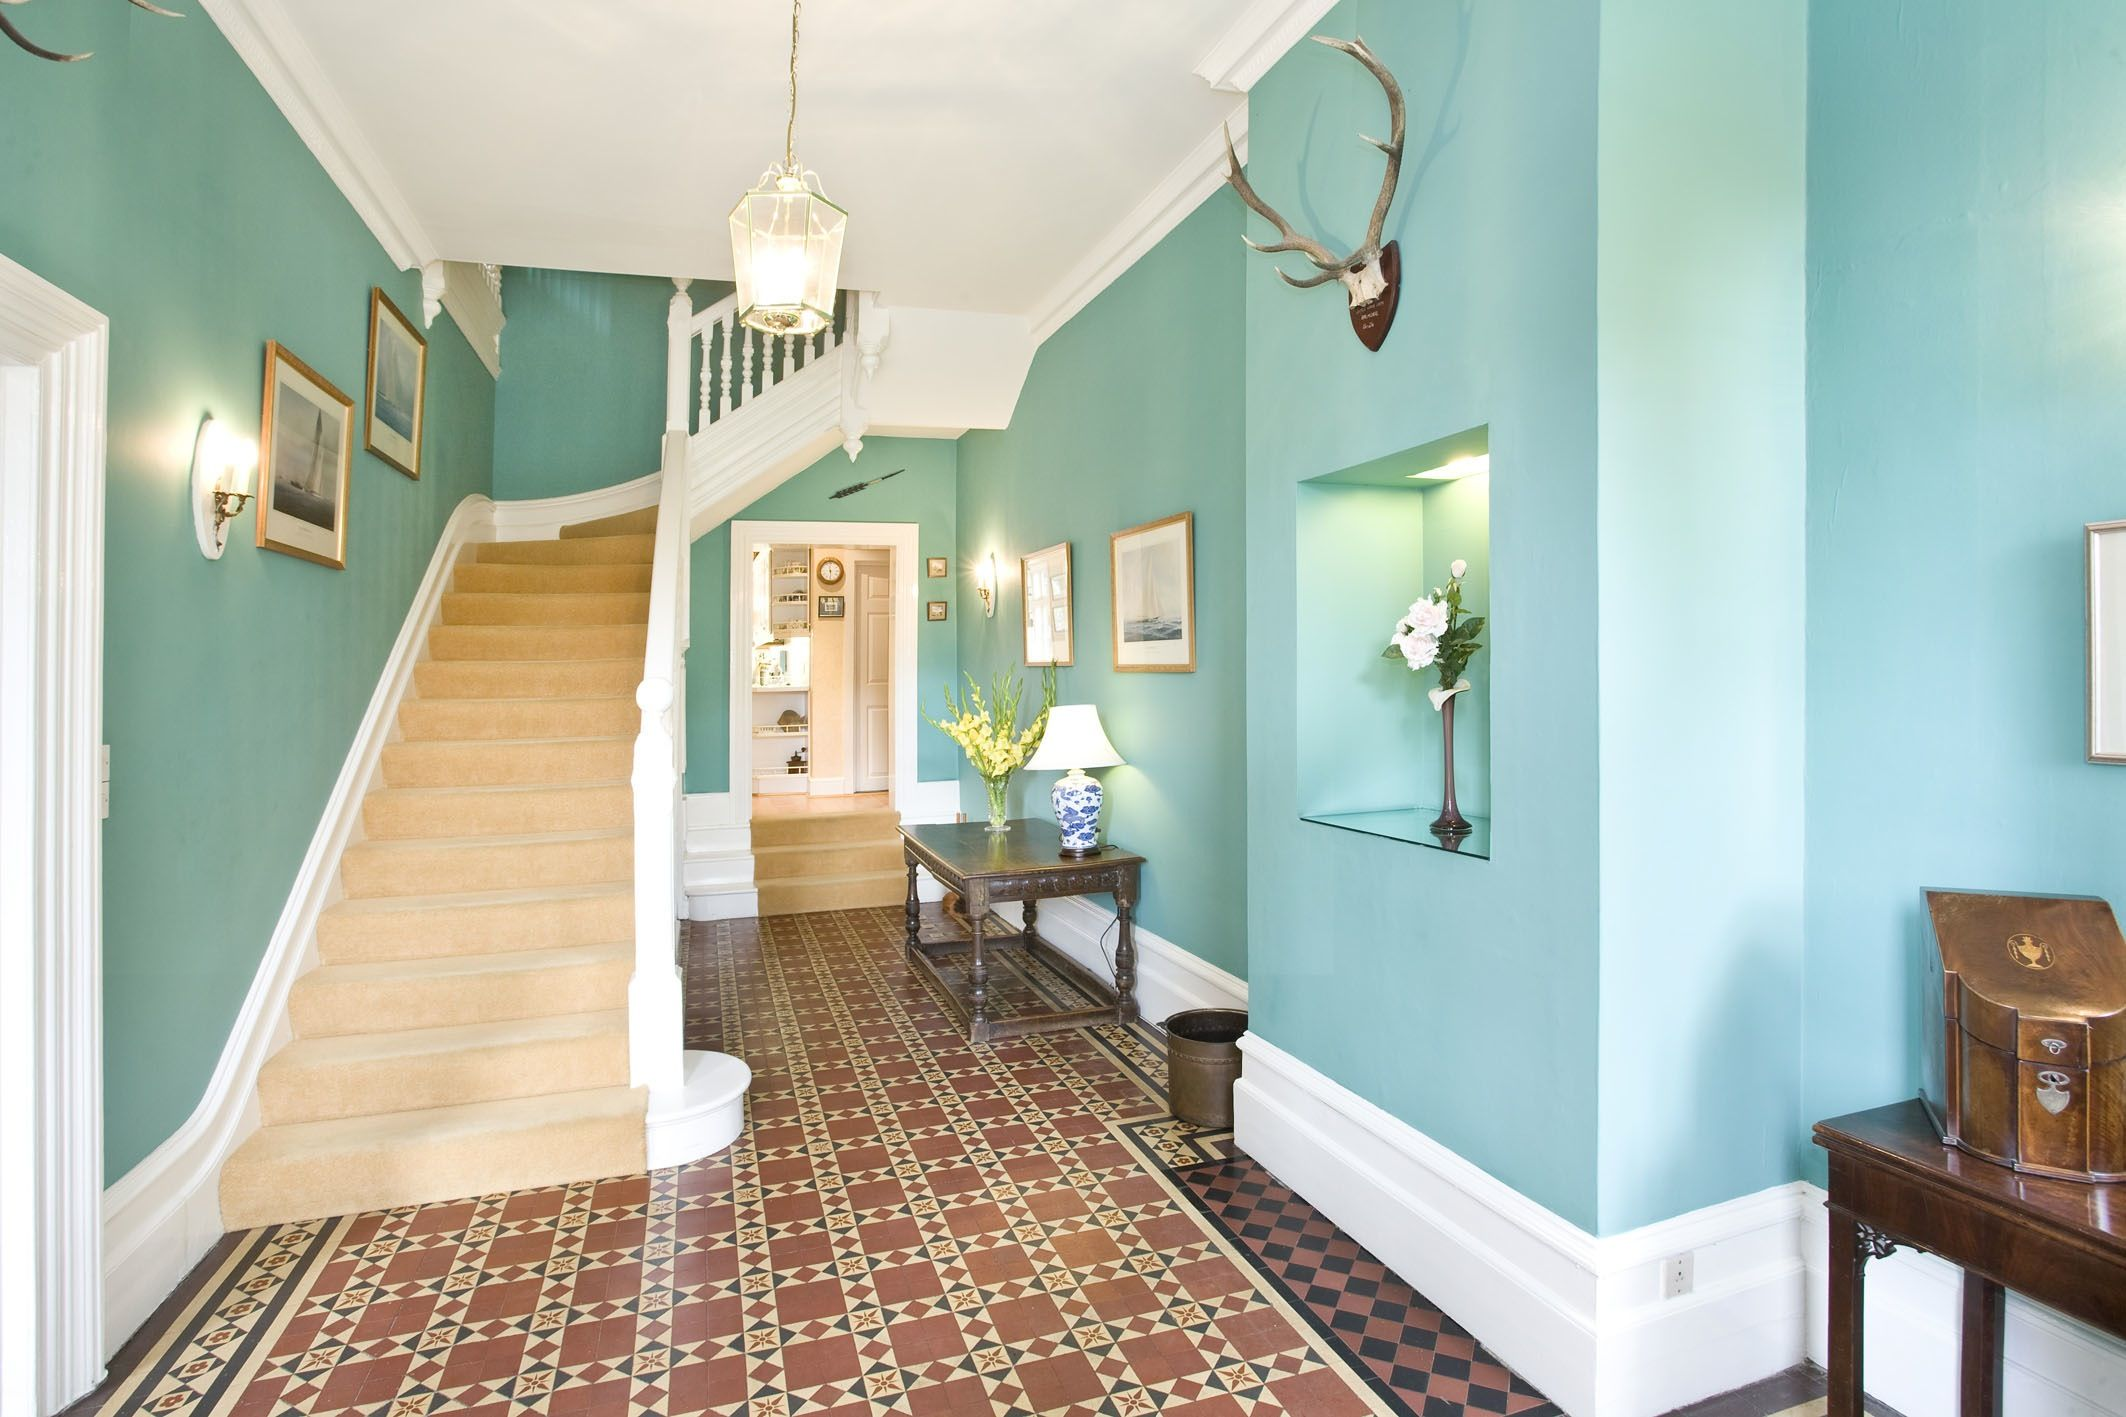 old hallway   Home Design   Pinterest   Hall, Hallway colors and ...